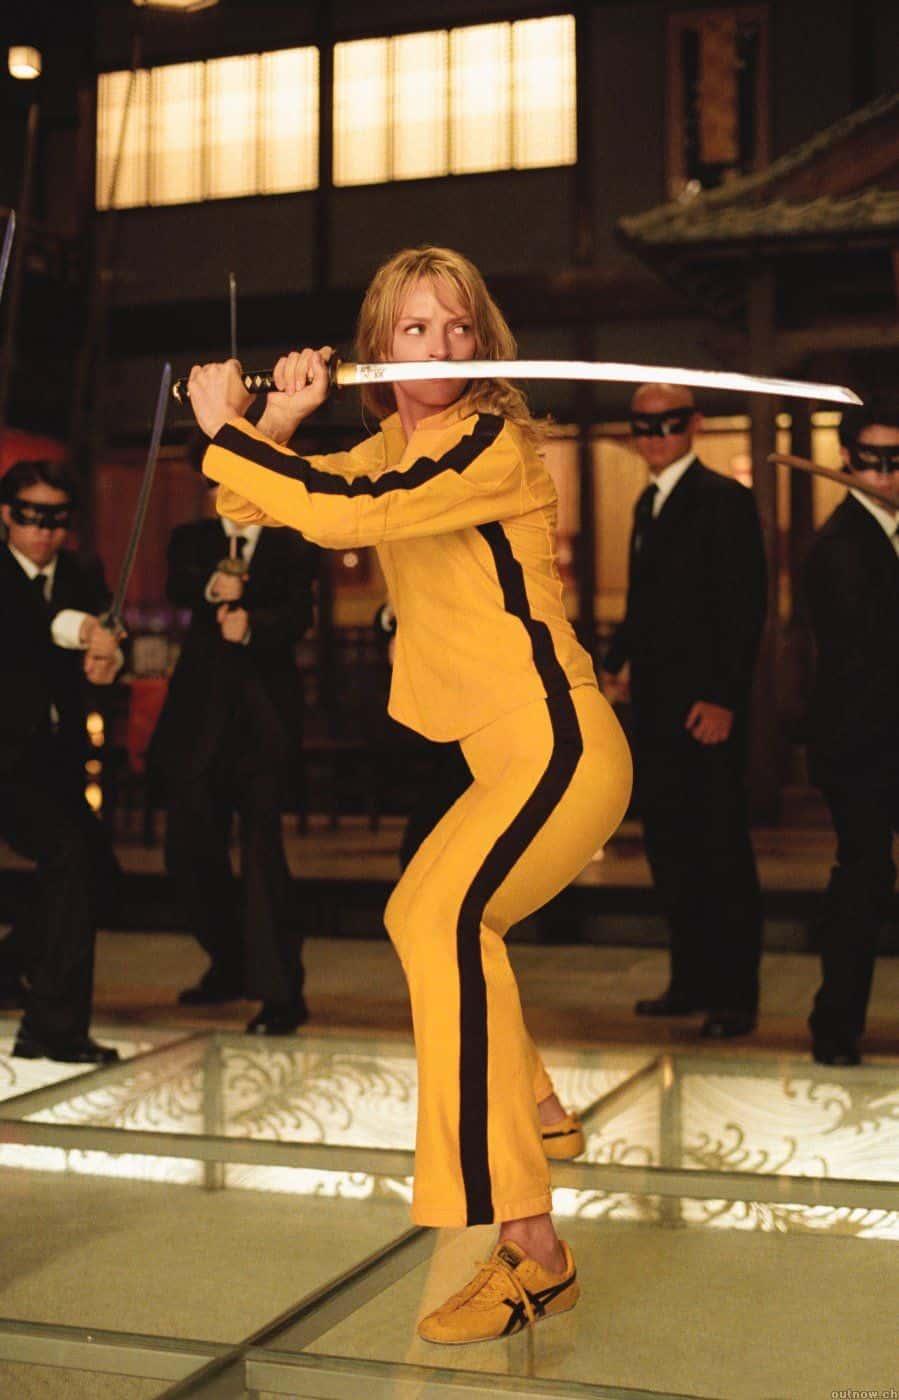 Kill Bill 3 Podria Unir A Uma Thurman Y A Su Hija Maya Hawke En La Pantalla